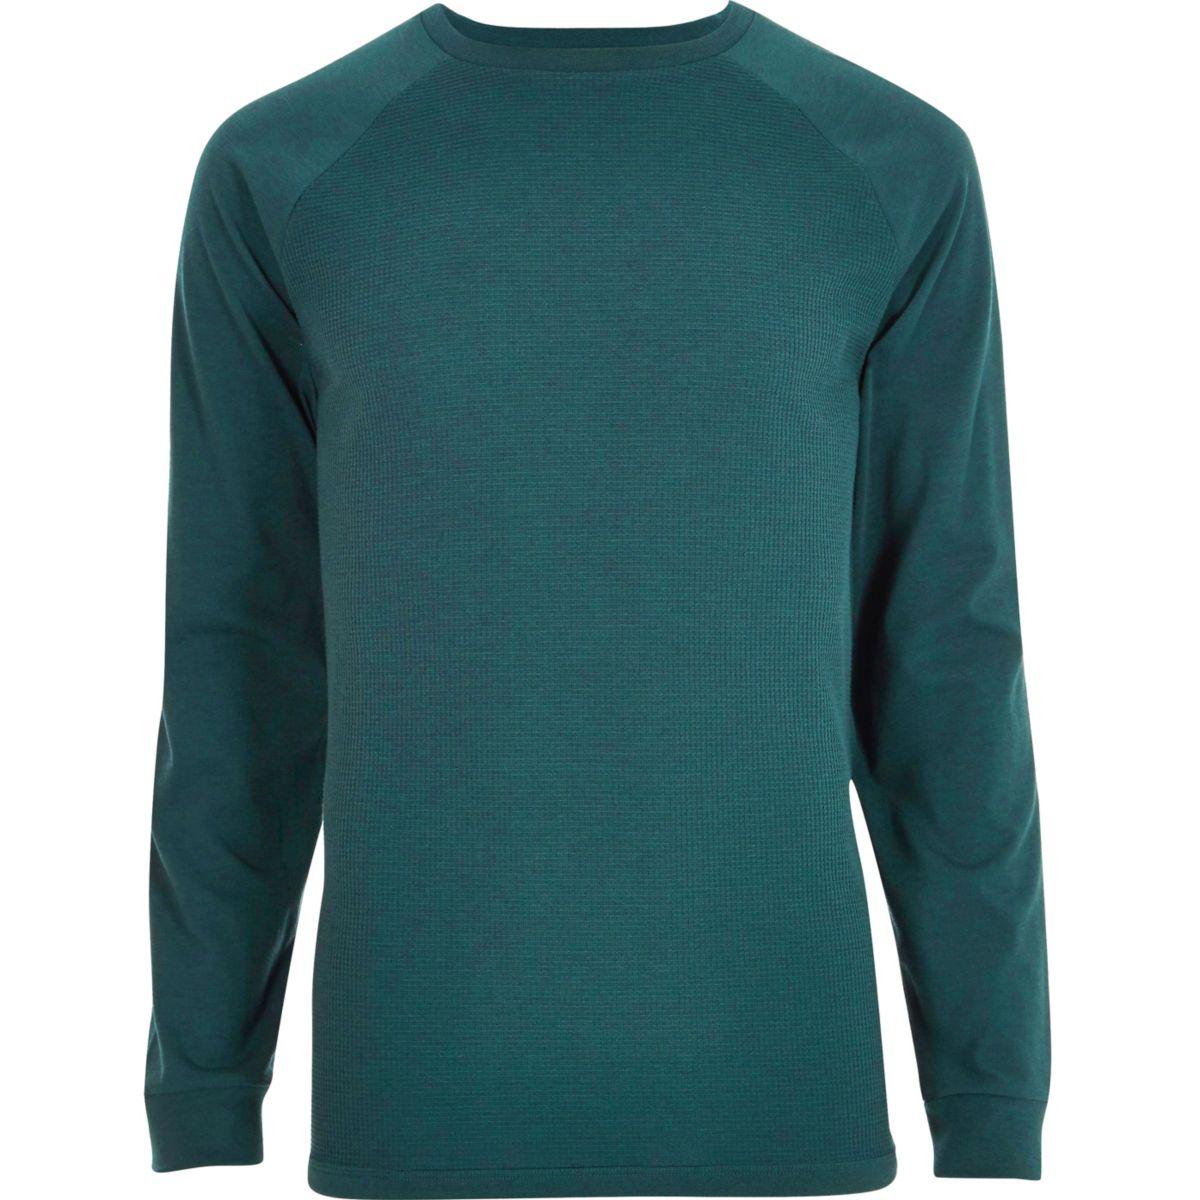 Turquoise raglan sleeve slim fit T-shirt